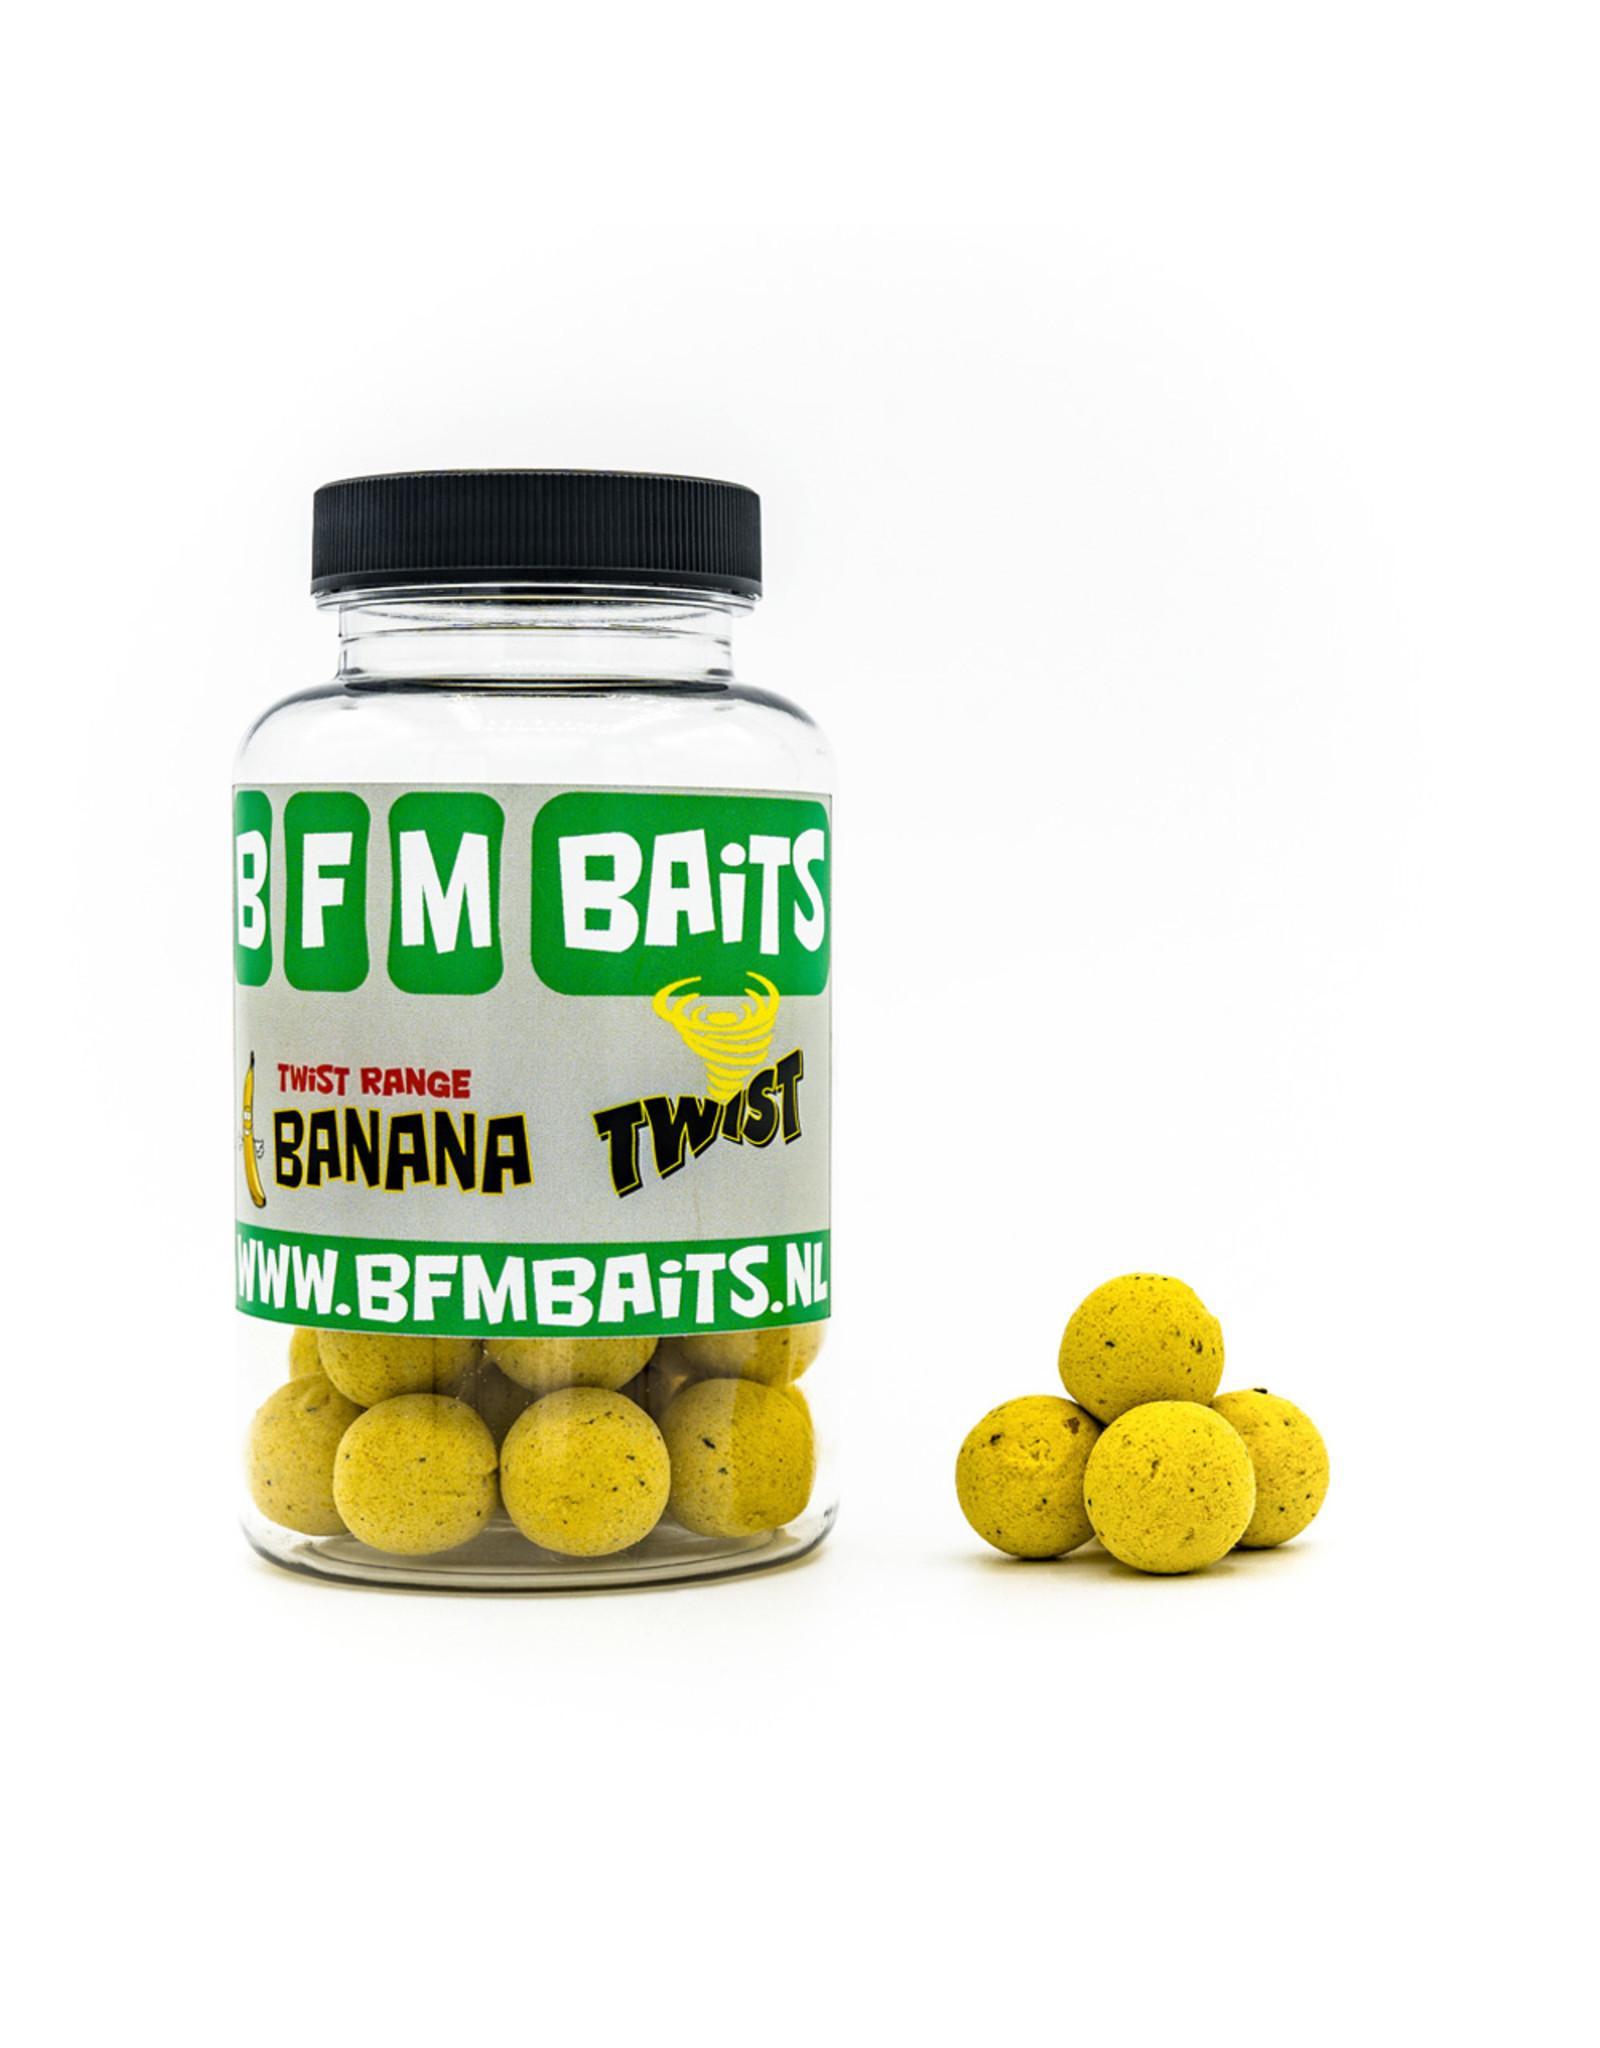 BFM Baits Banana Twist  boilies - Bucket deal